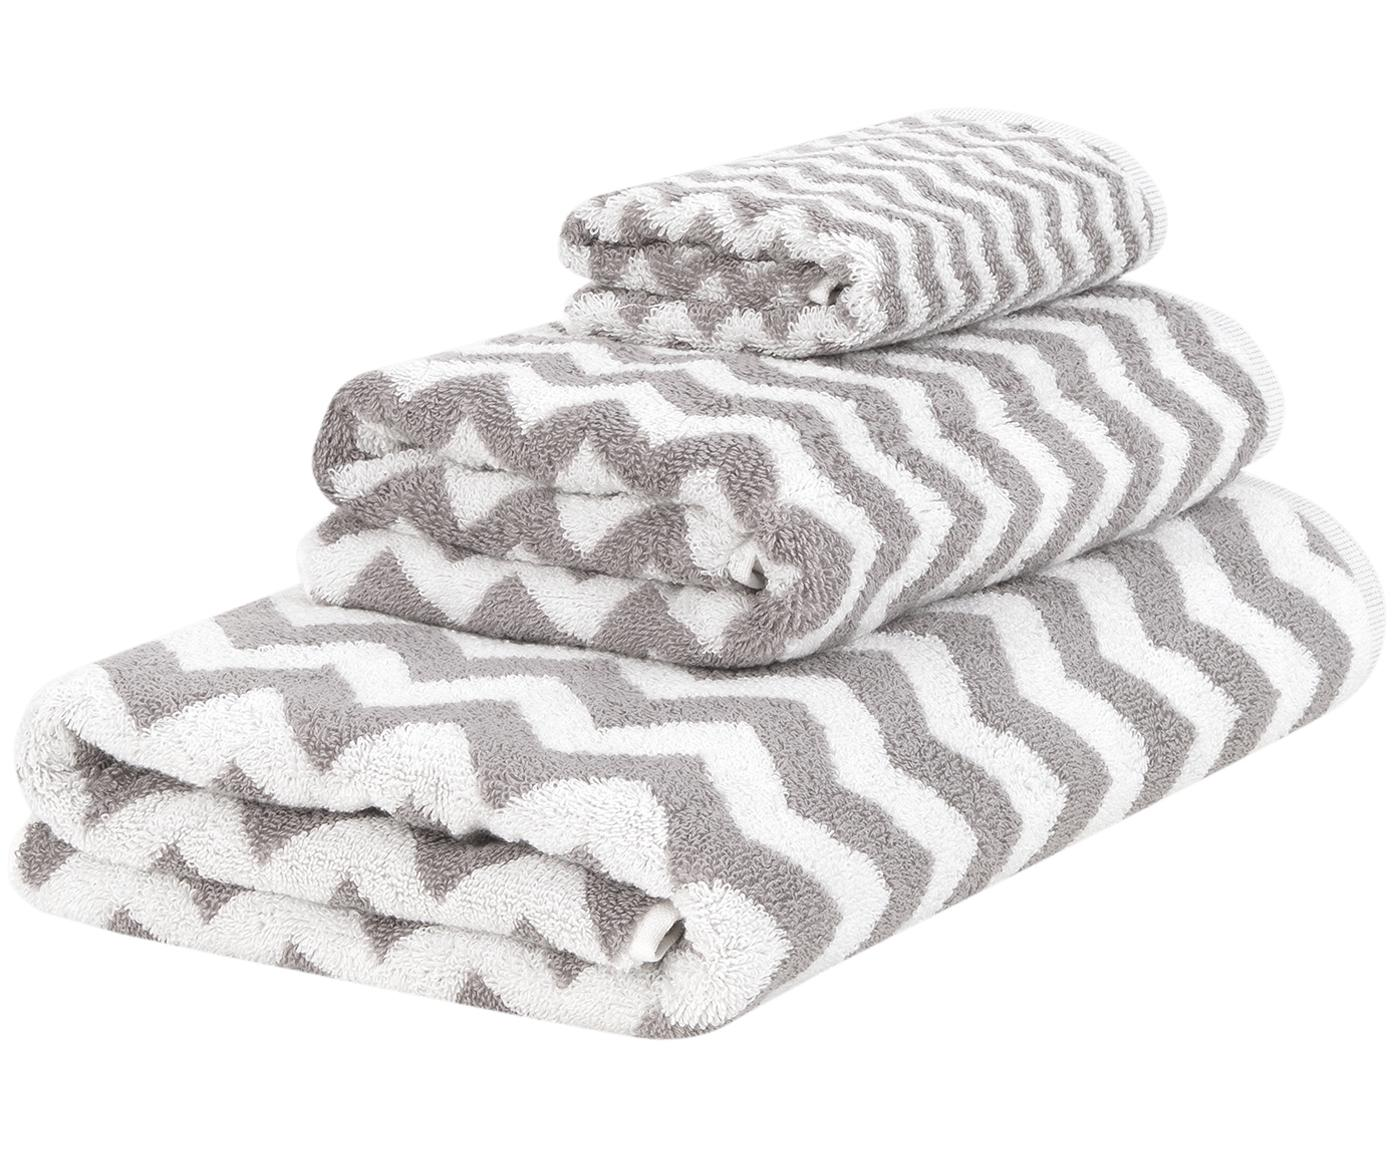 Set de toallas Liv, 3pzas., Gris, blanco cremoso, Tamaños diferentes